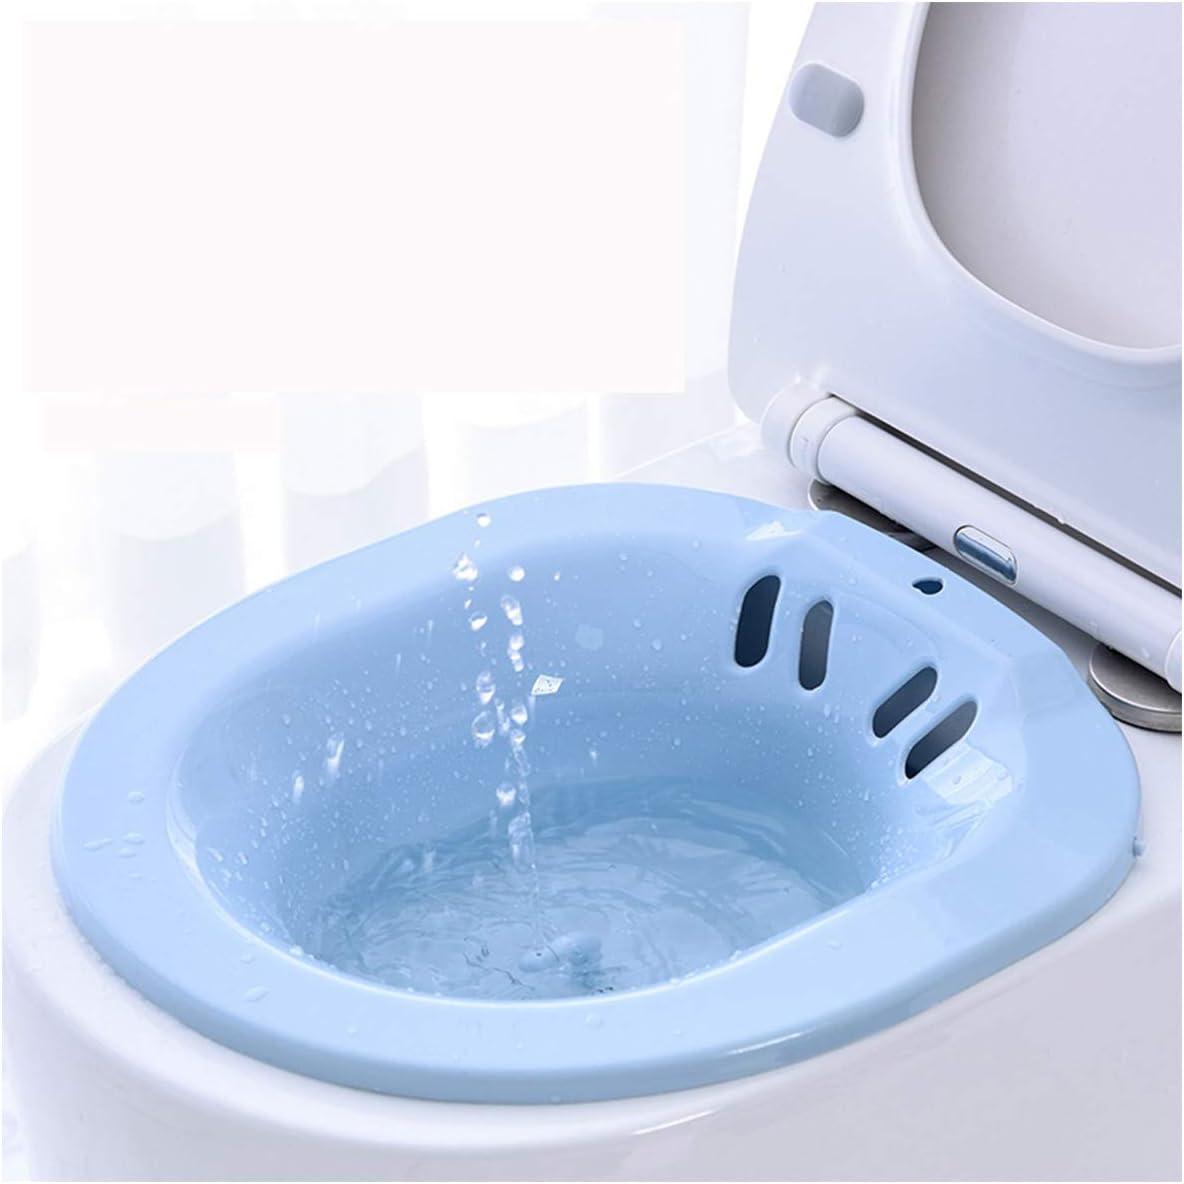 Popular shop is the lowest price challenge Yoni Steam kit Sitz Bath - Electric Postpartum Time sale Care Essential H